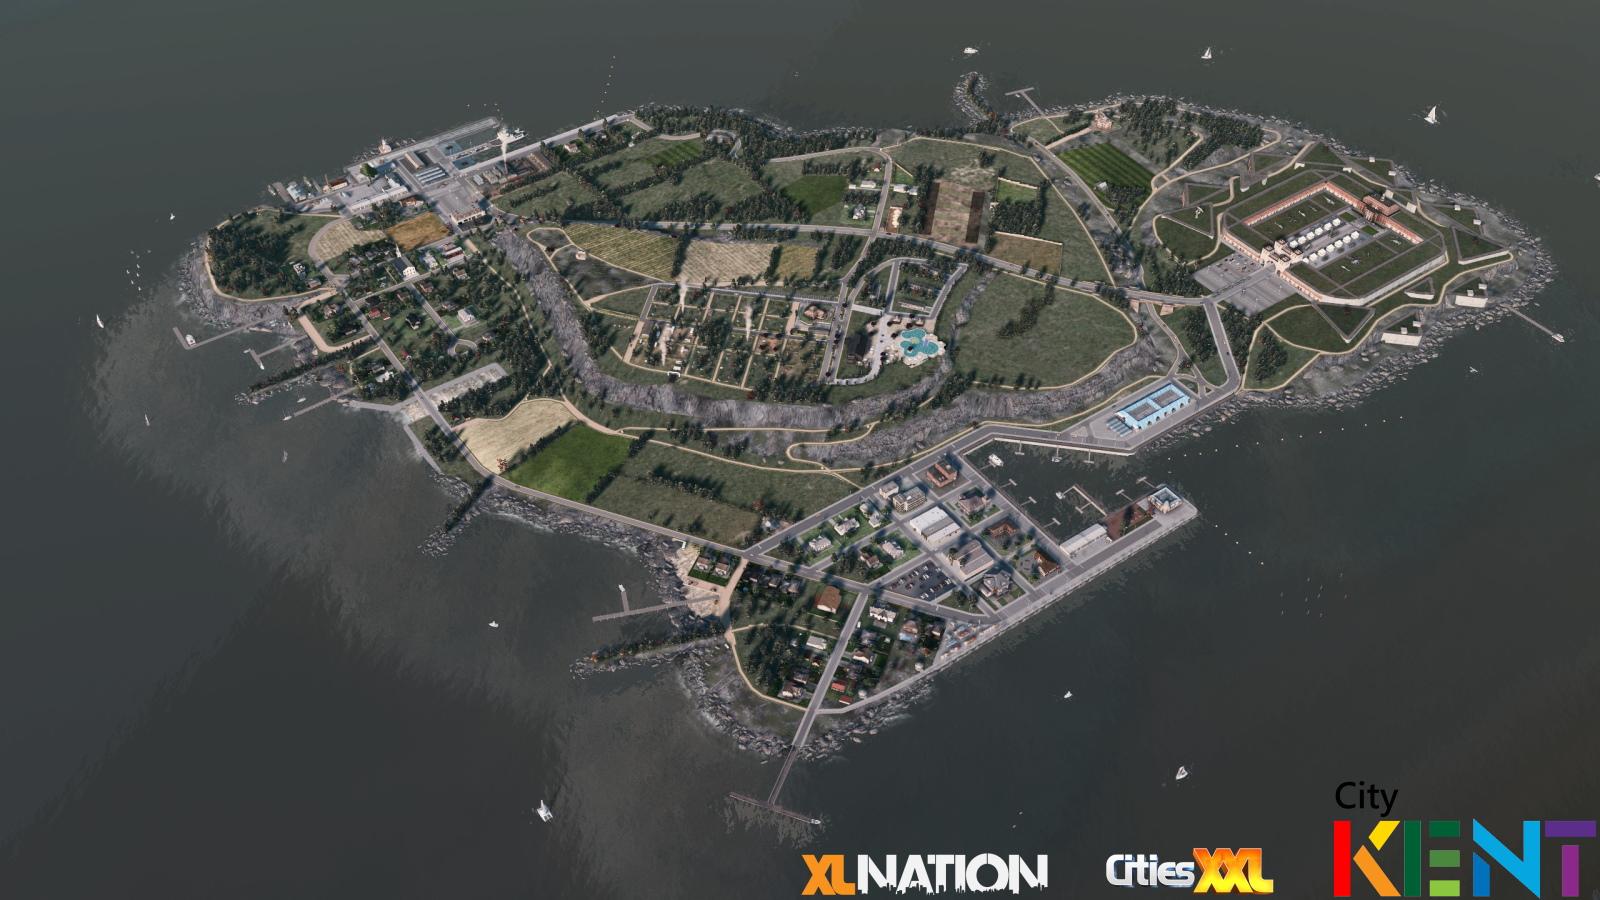 [Cities XXL] Kent - Page 2 Abraham-island_kent11_xln_citiesxxl-jpg